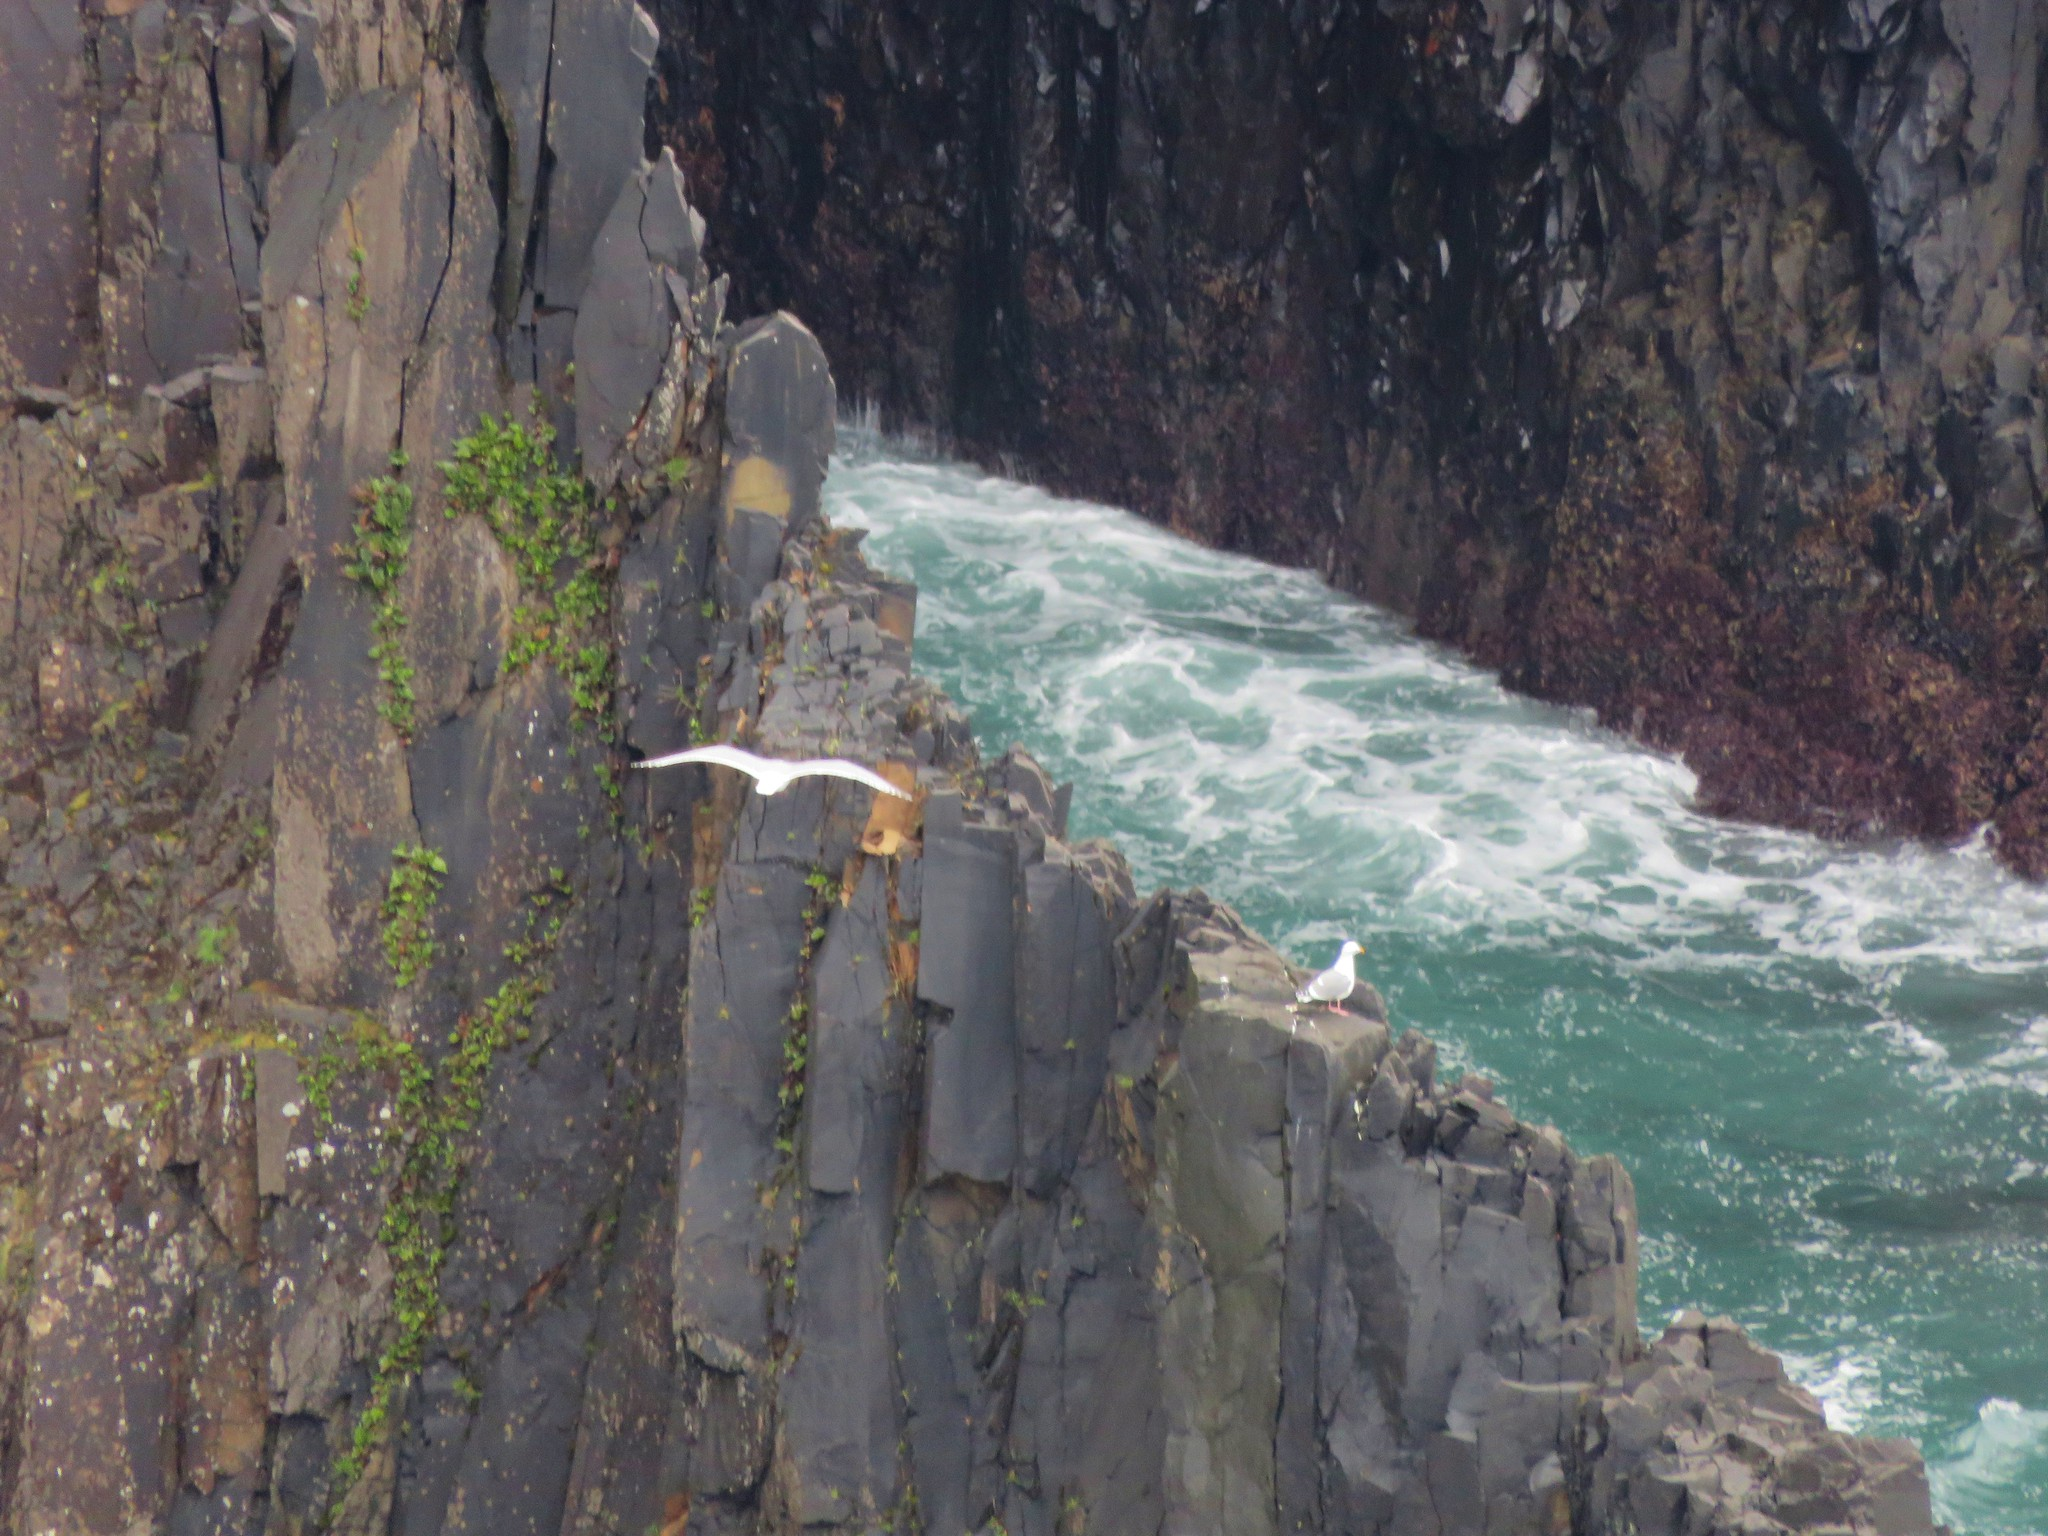 Seagulls near the sea caves